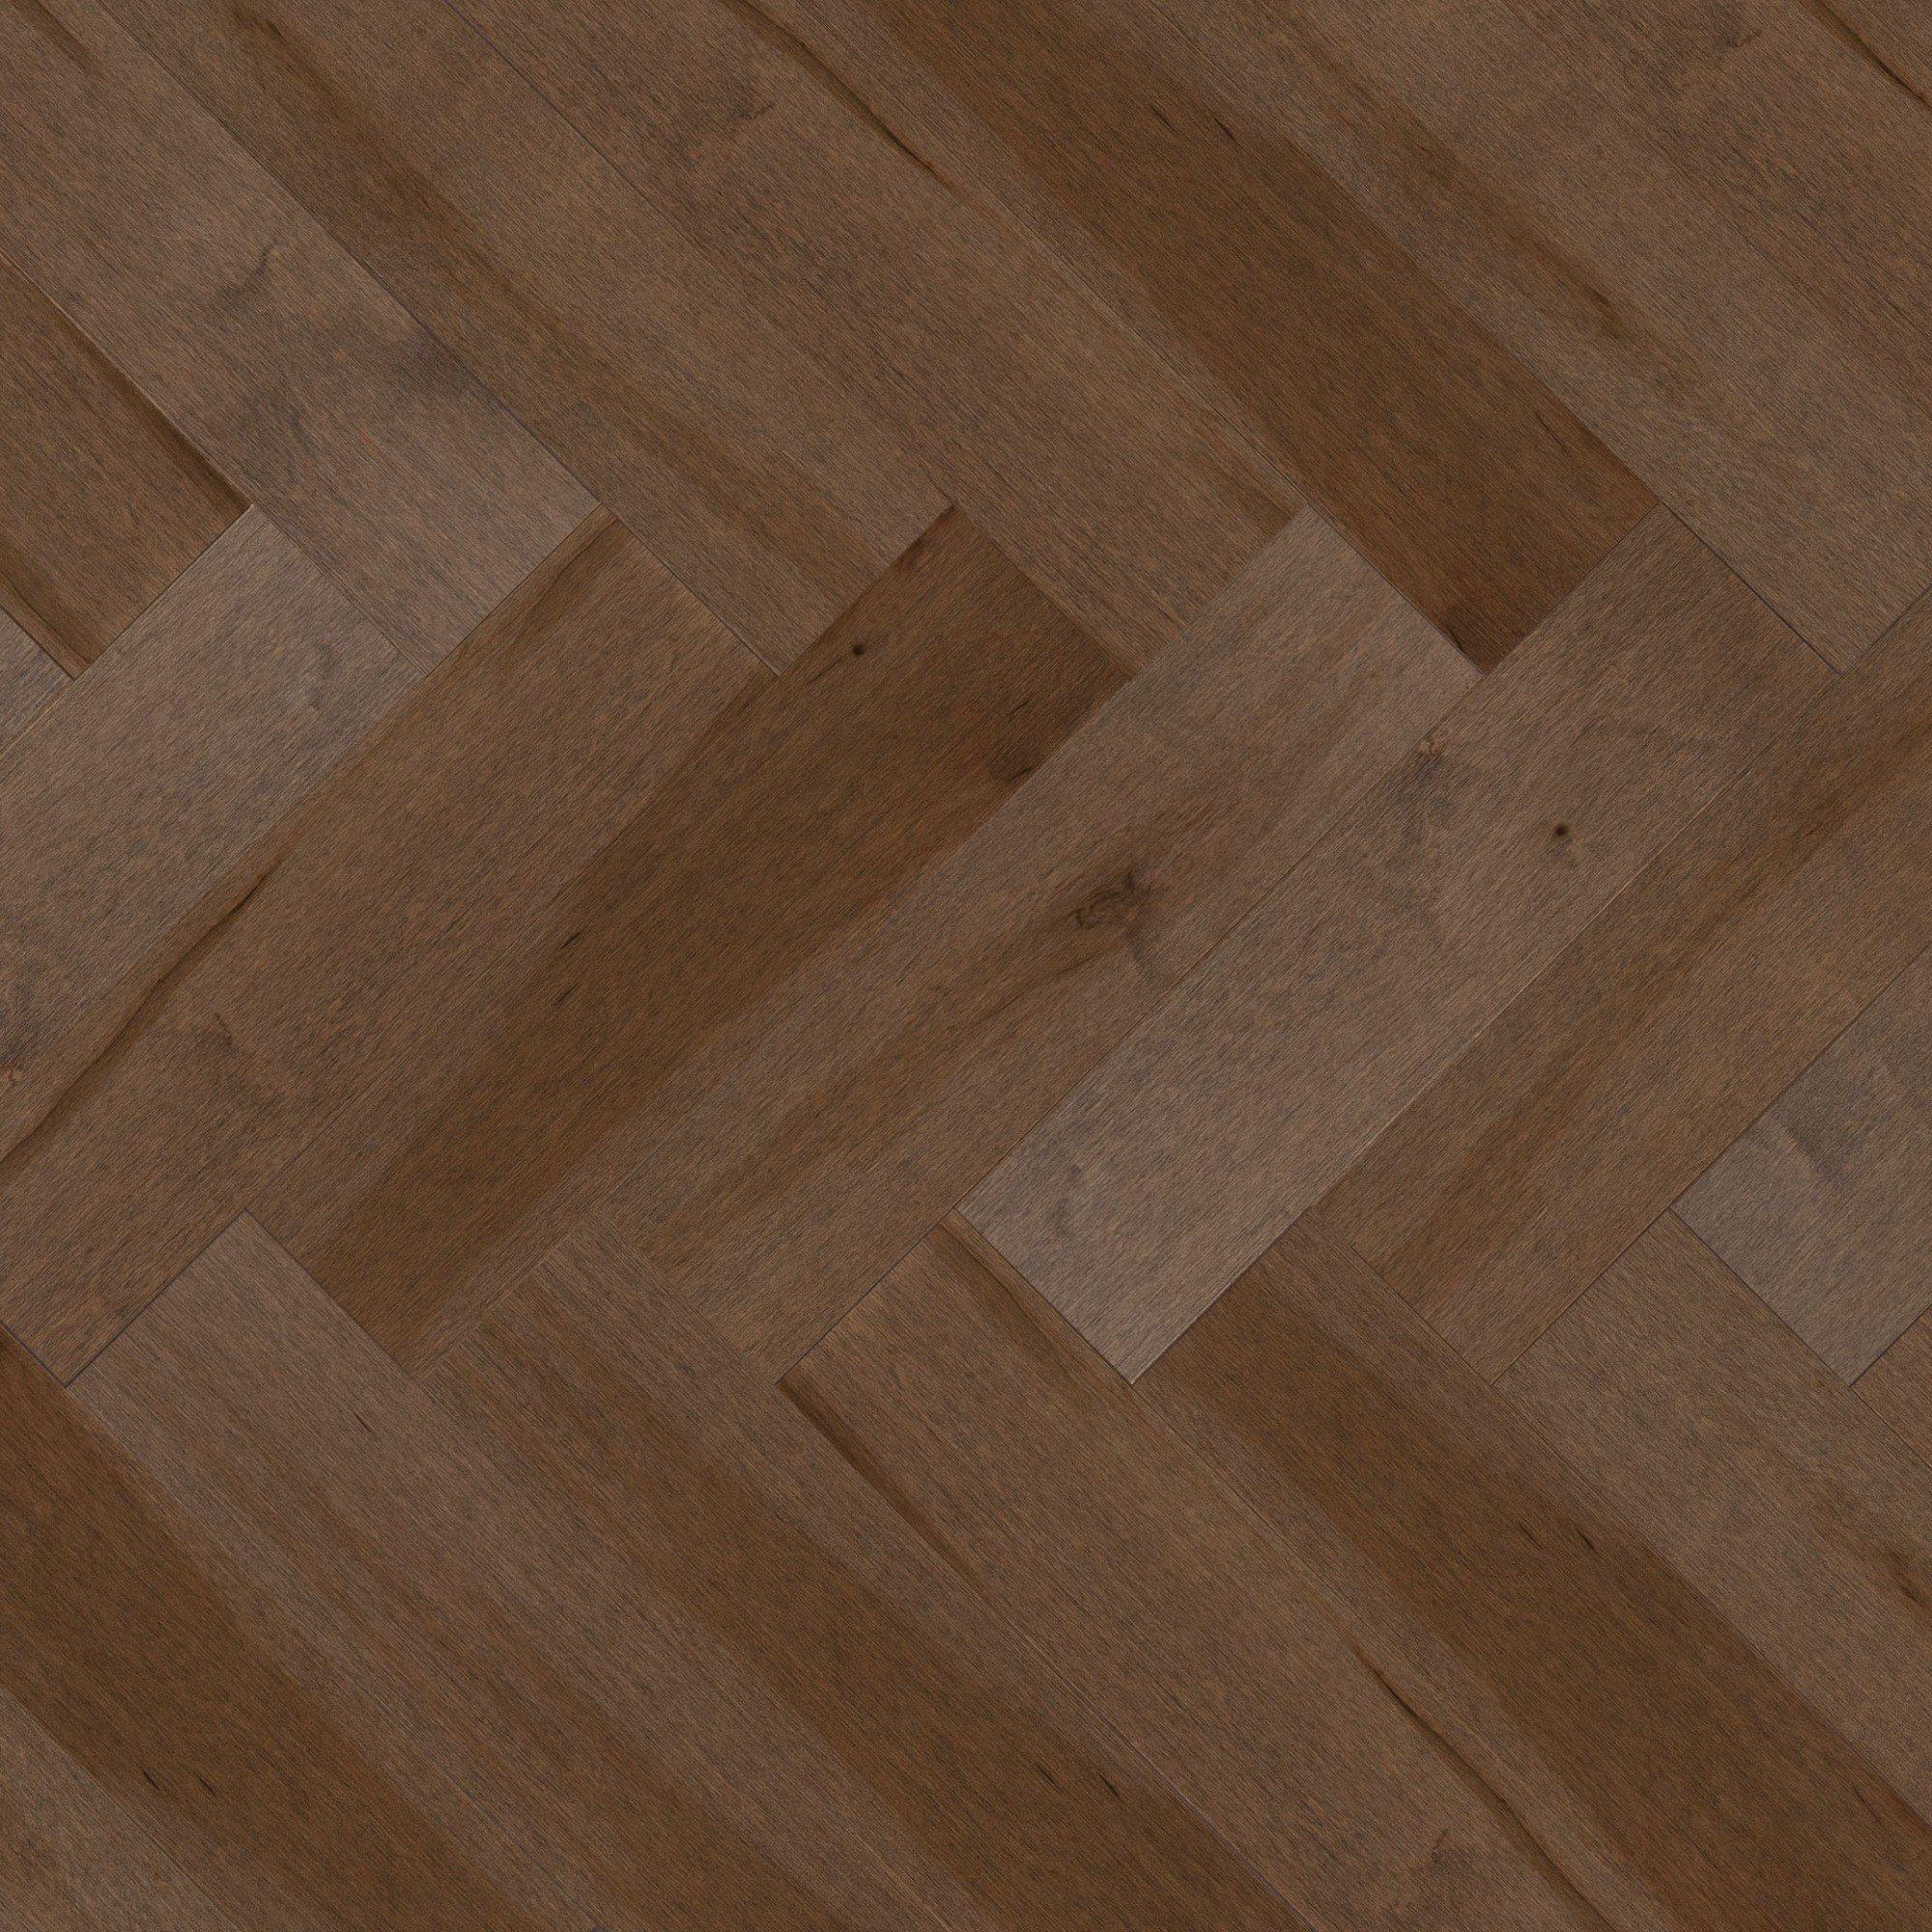 Maple Savanna Exclusive Engraved - Floor image